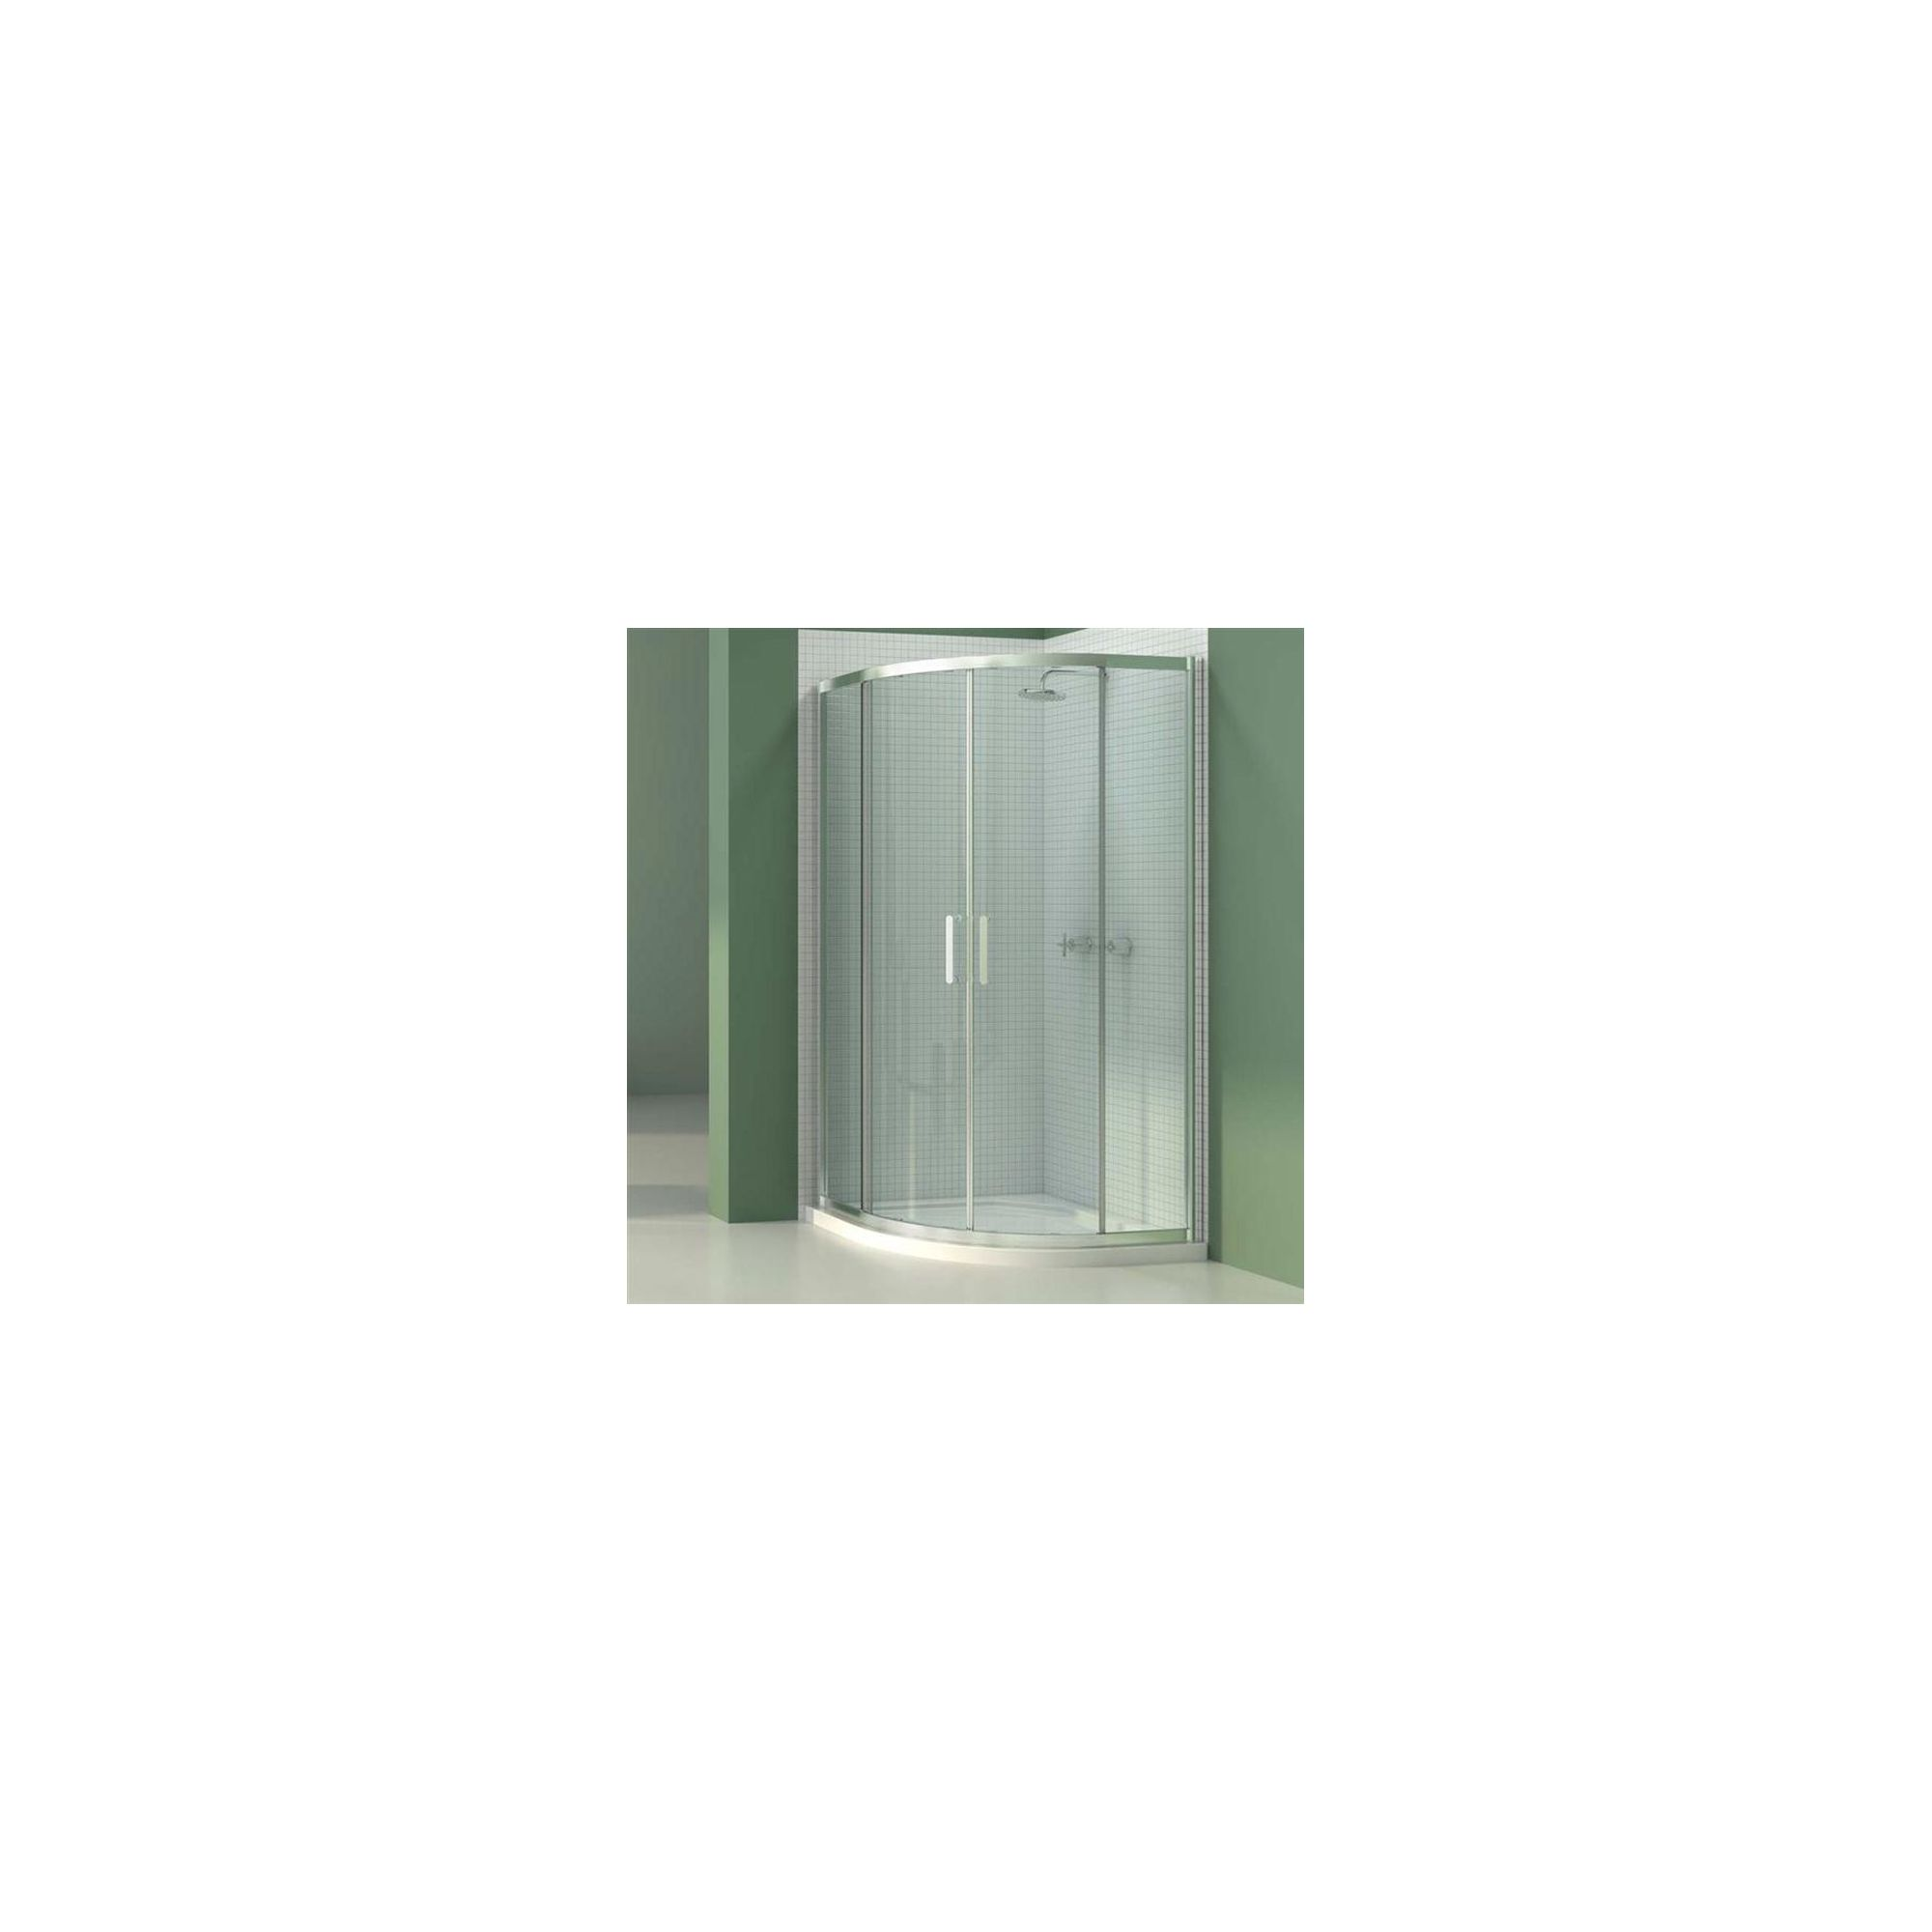 Merlyn Vivid Six Quadrant Shower Door, 900mm x 900mm, 6mm Glass at Tesco Direct